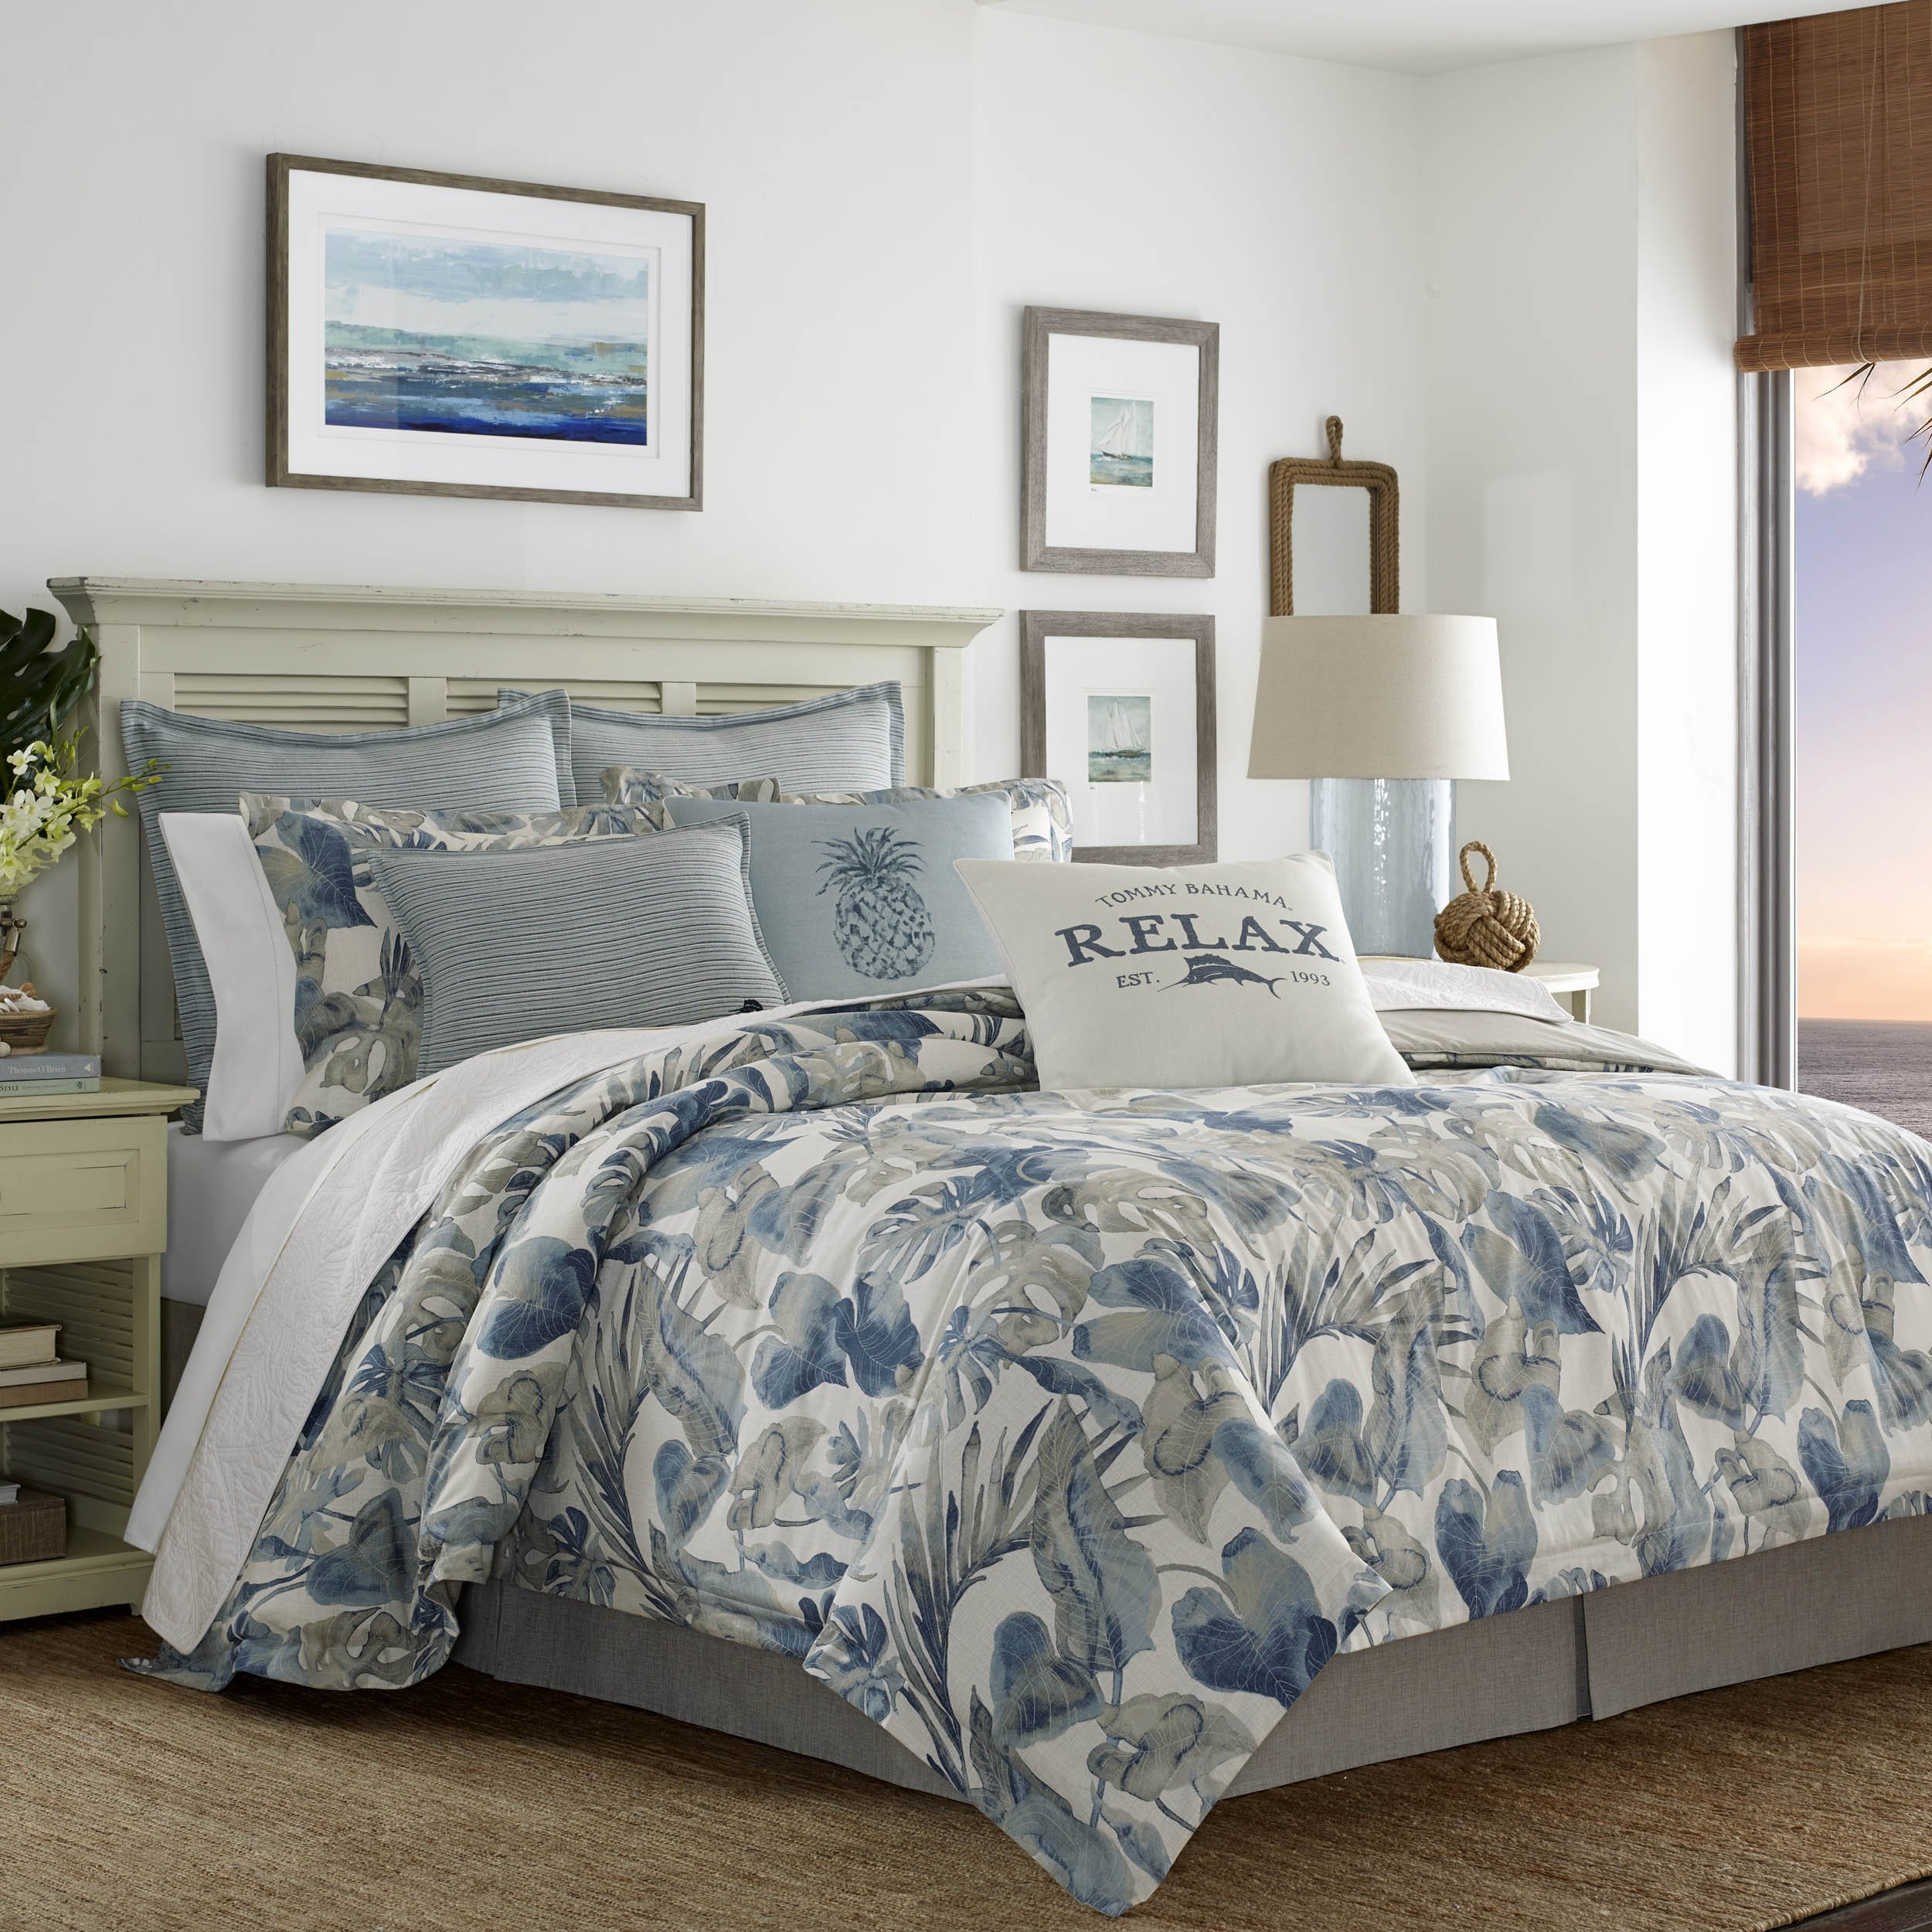 Tommy Bahama 221193 Raw Coast Comforter Set, King, Blue by Tommy Bahama